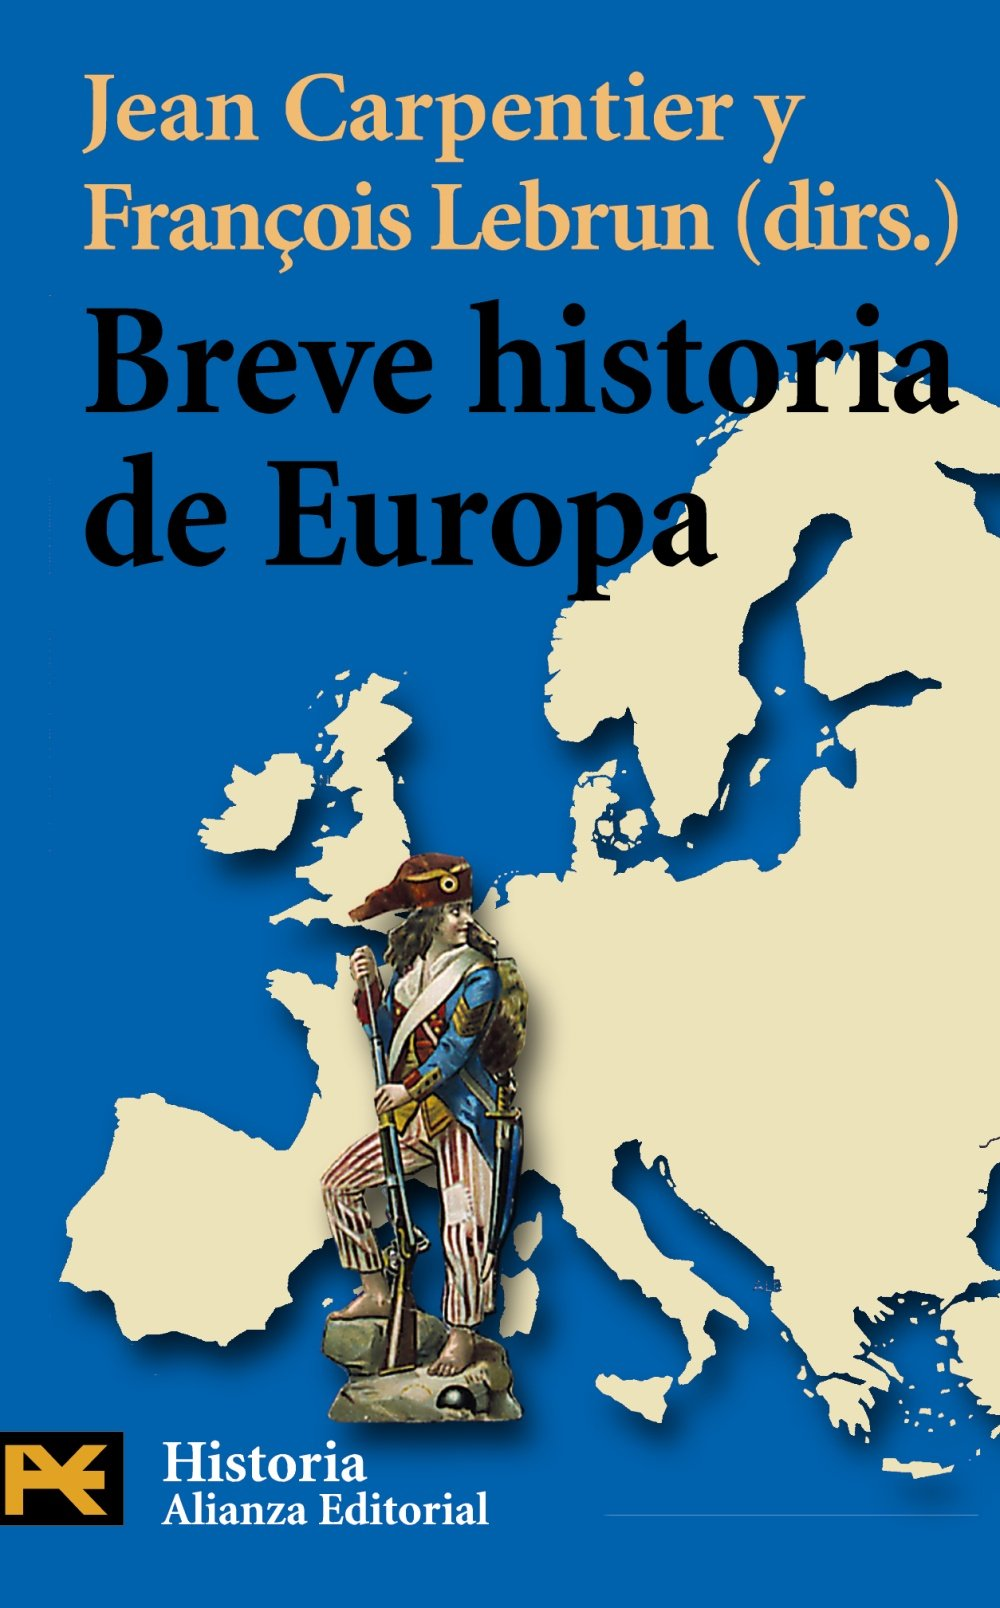 Breve historia de Europa El Libro De Bolsillo - Historia: Amazon.es: Carpentier, Jean, Lebrun, Francois, Armiño, Mauro: Libros